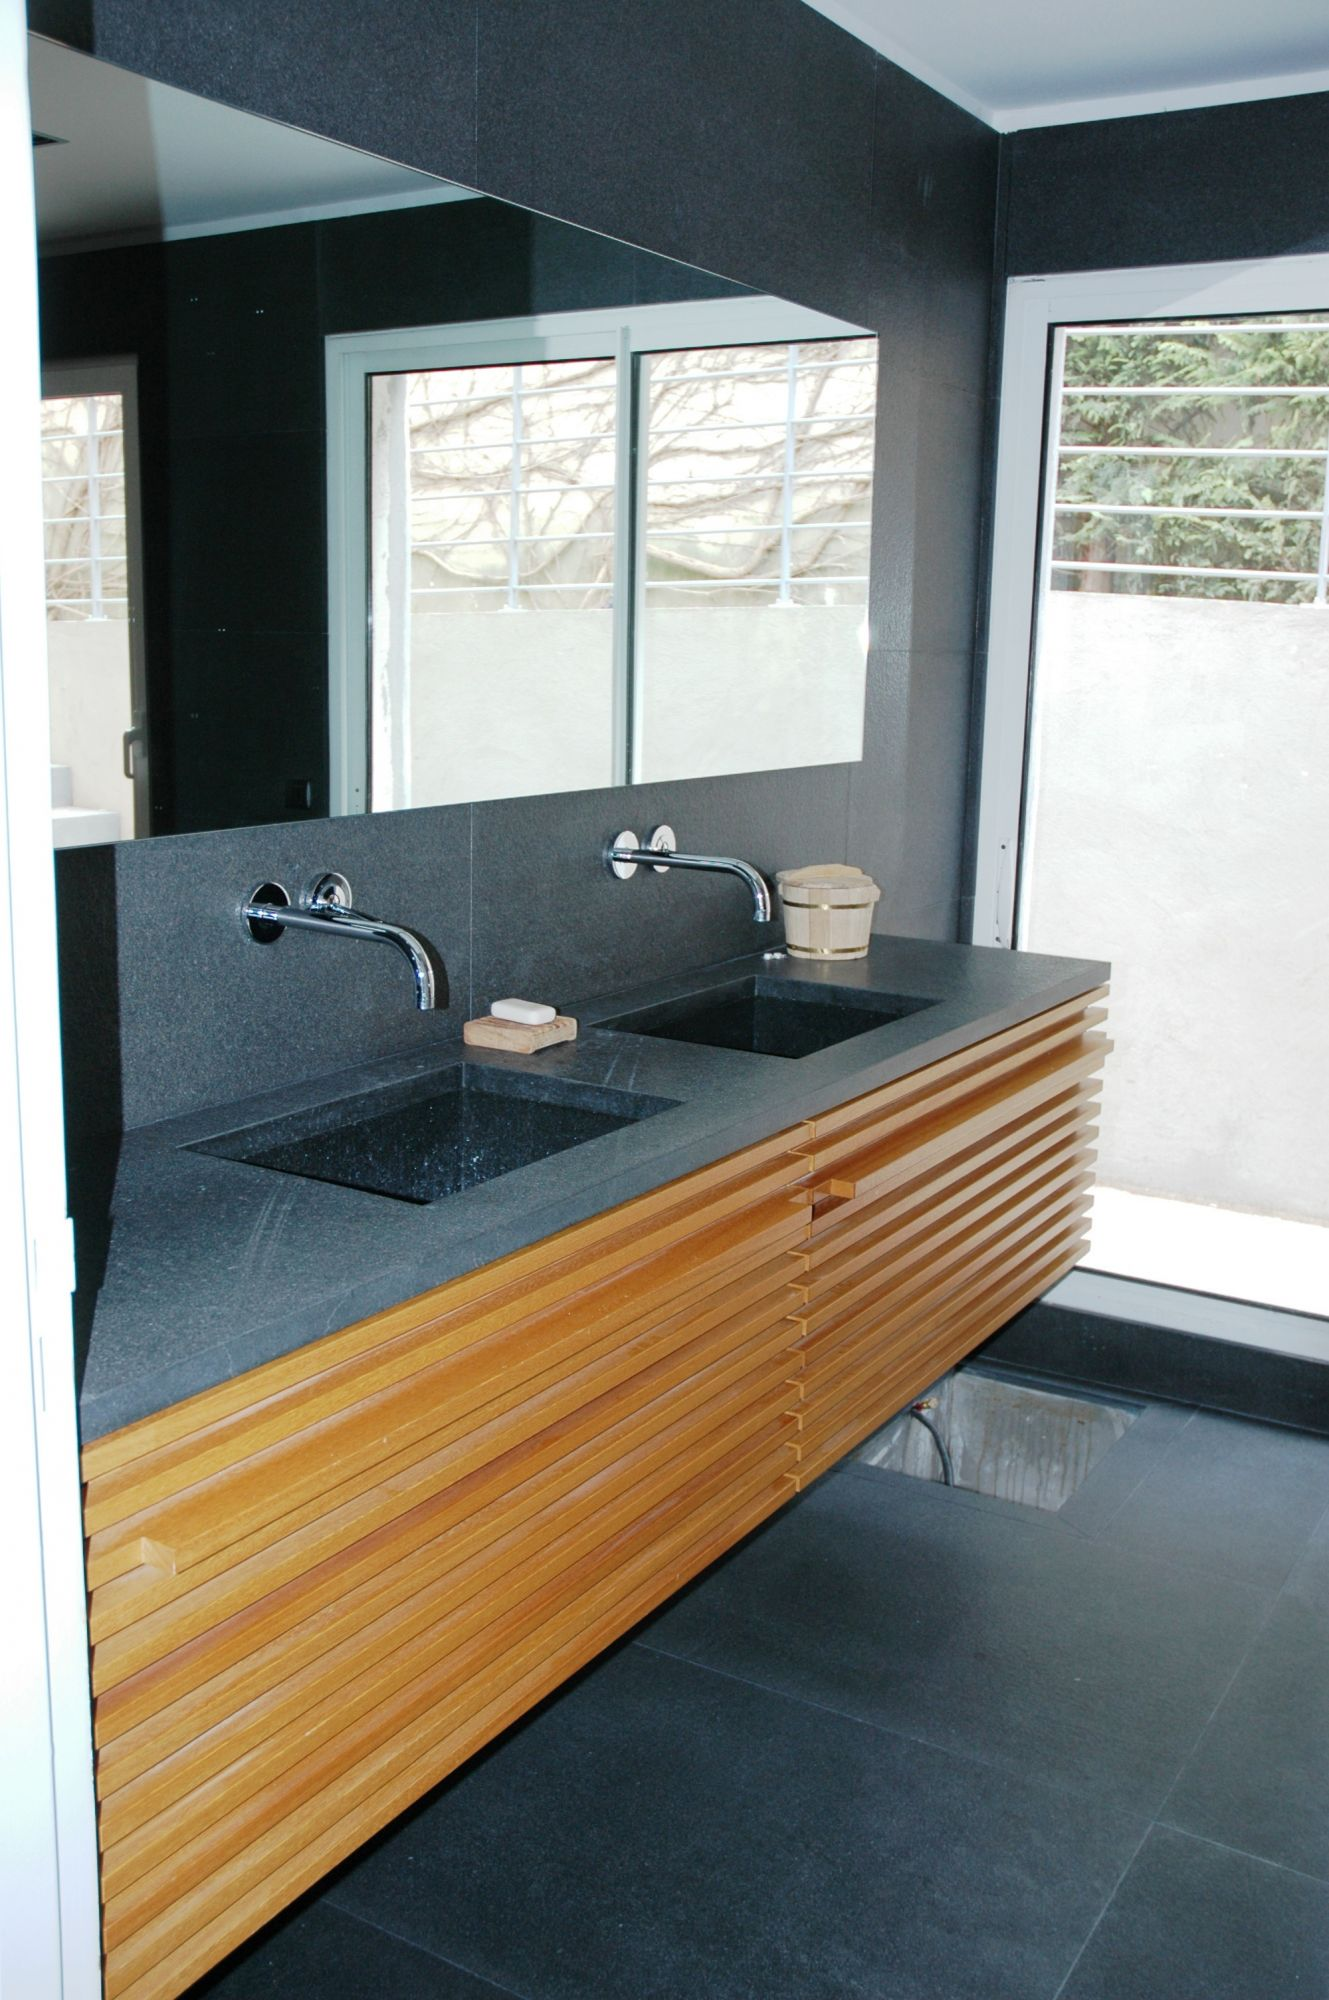 salle de bain iroko verni naturel marseille miramond. Black Bedroom Furniture Sets. Home Design Ideas